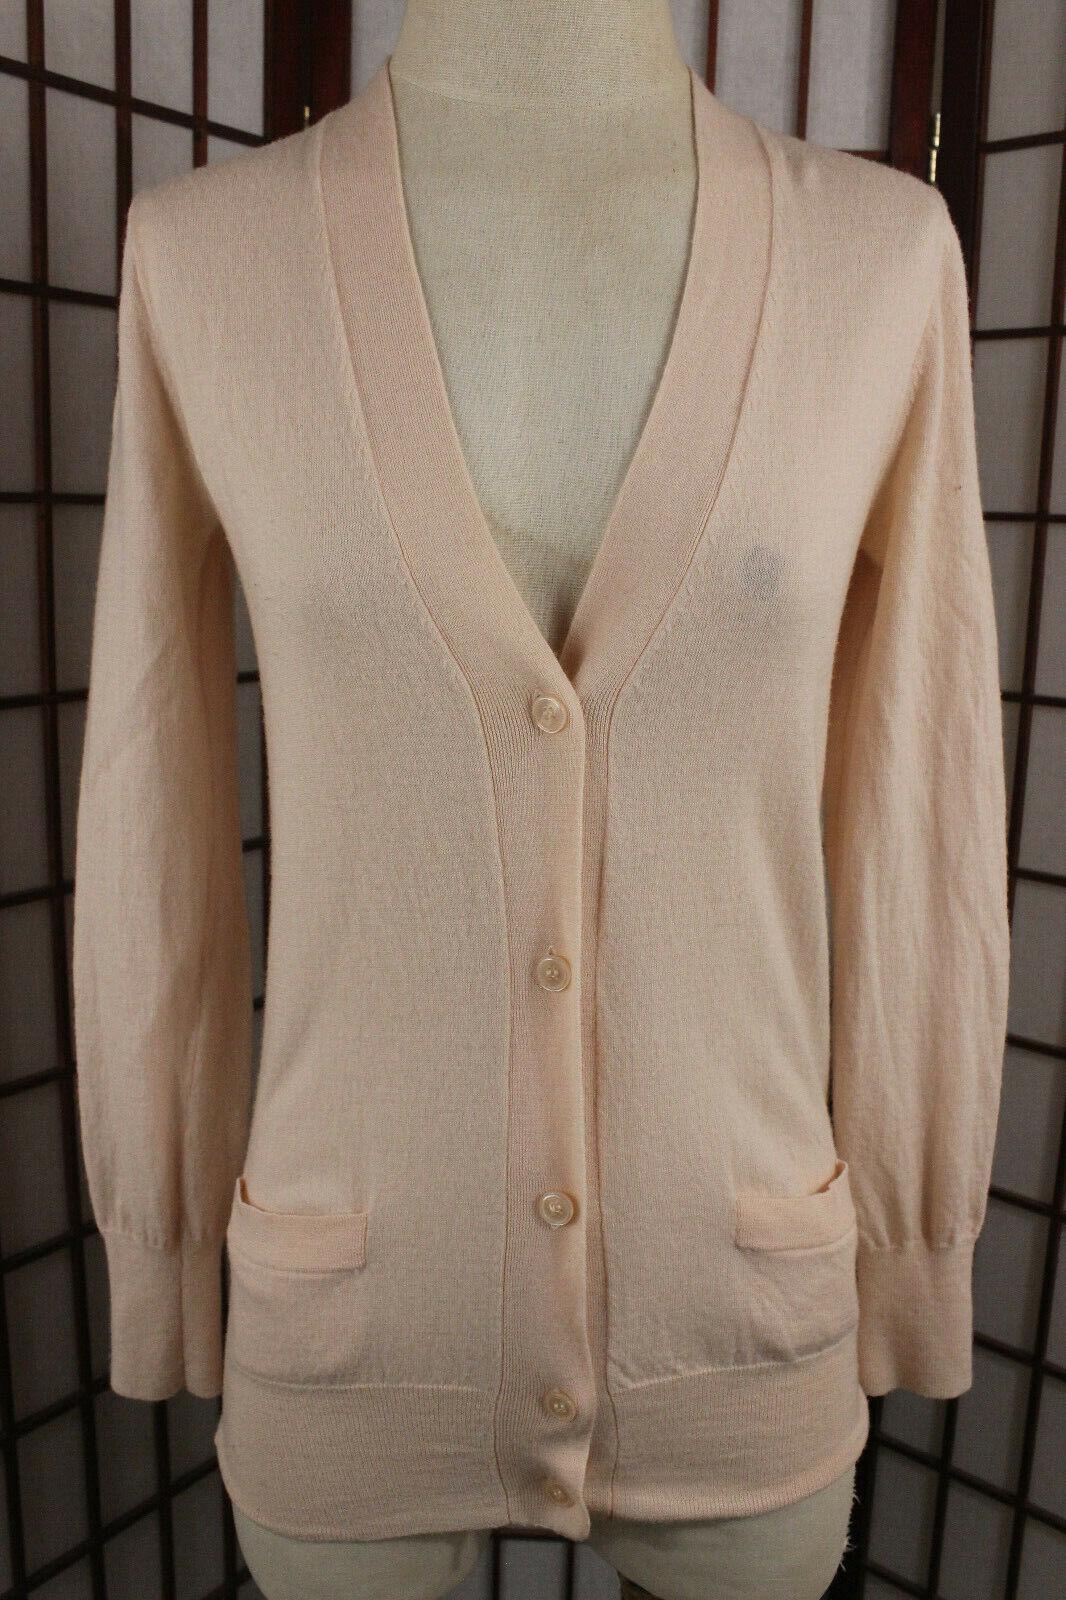 J Crew Merino Wool Classic Cardigan Sweater Sz Medium Peach Pink Semi Sheer